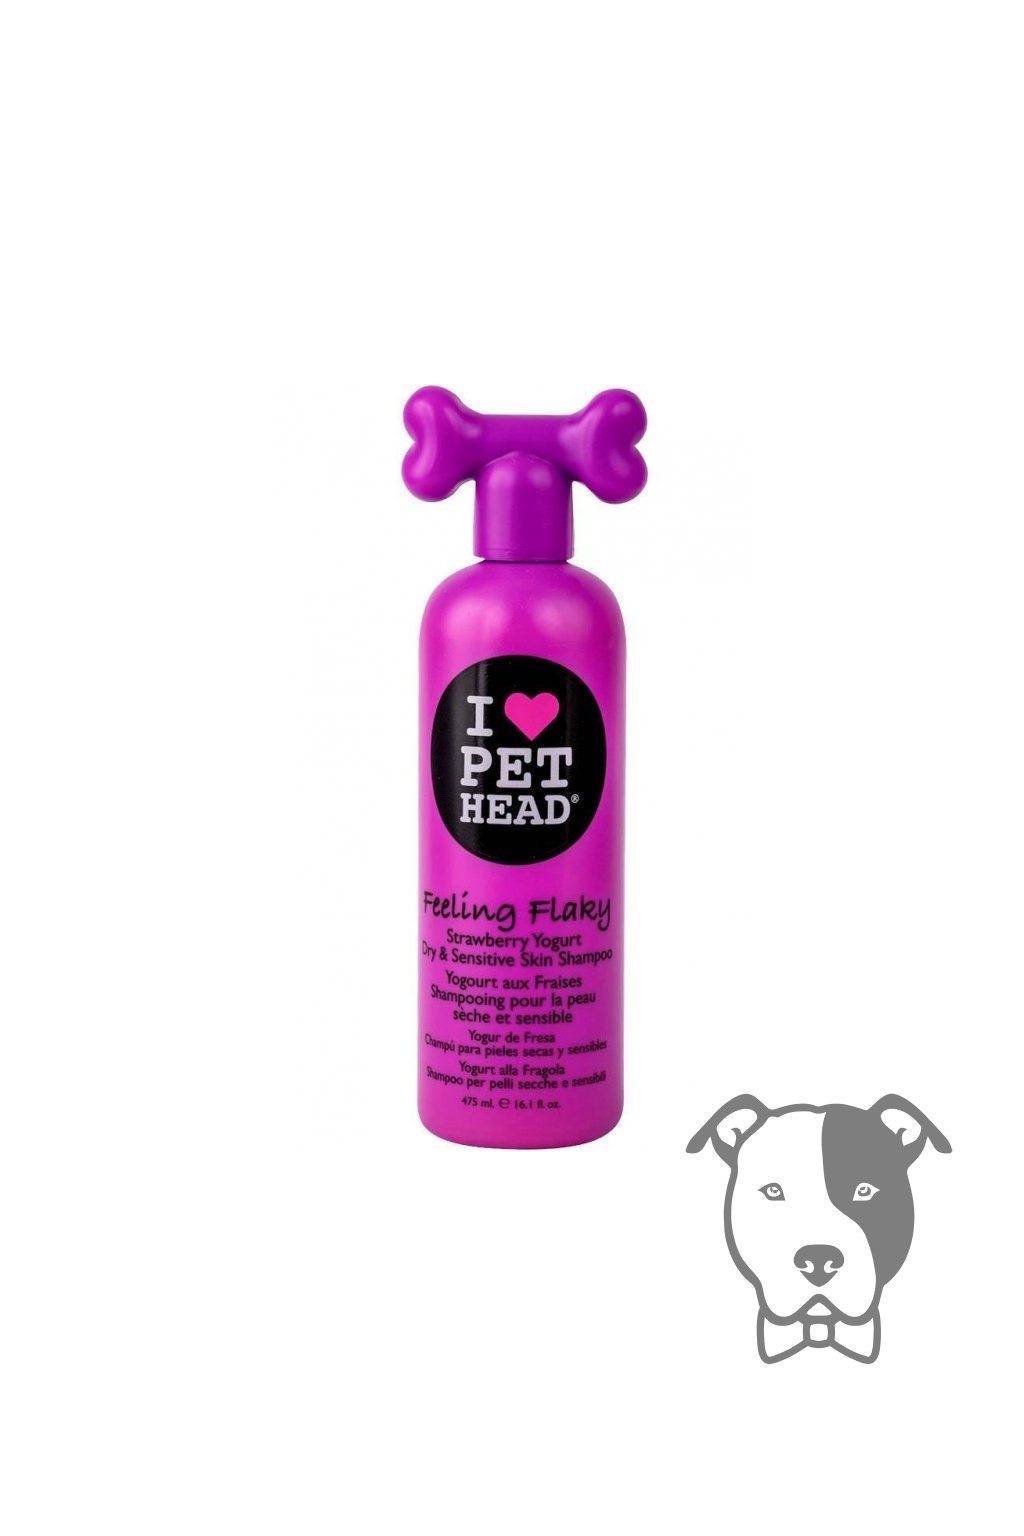 241 pet head feeling flaky drysensitive skin shampoo 2150 m3ymuyk0xc50njey